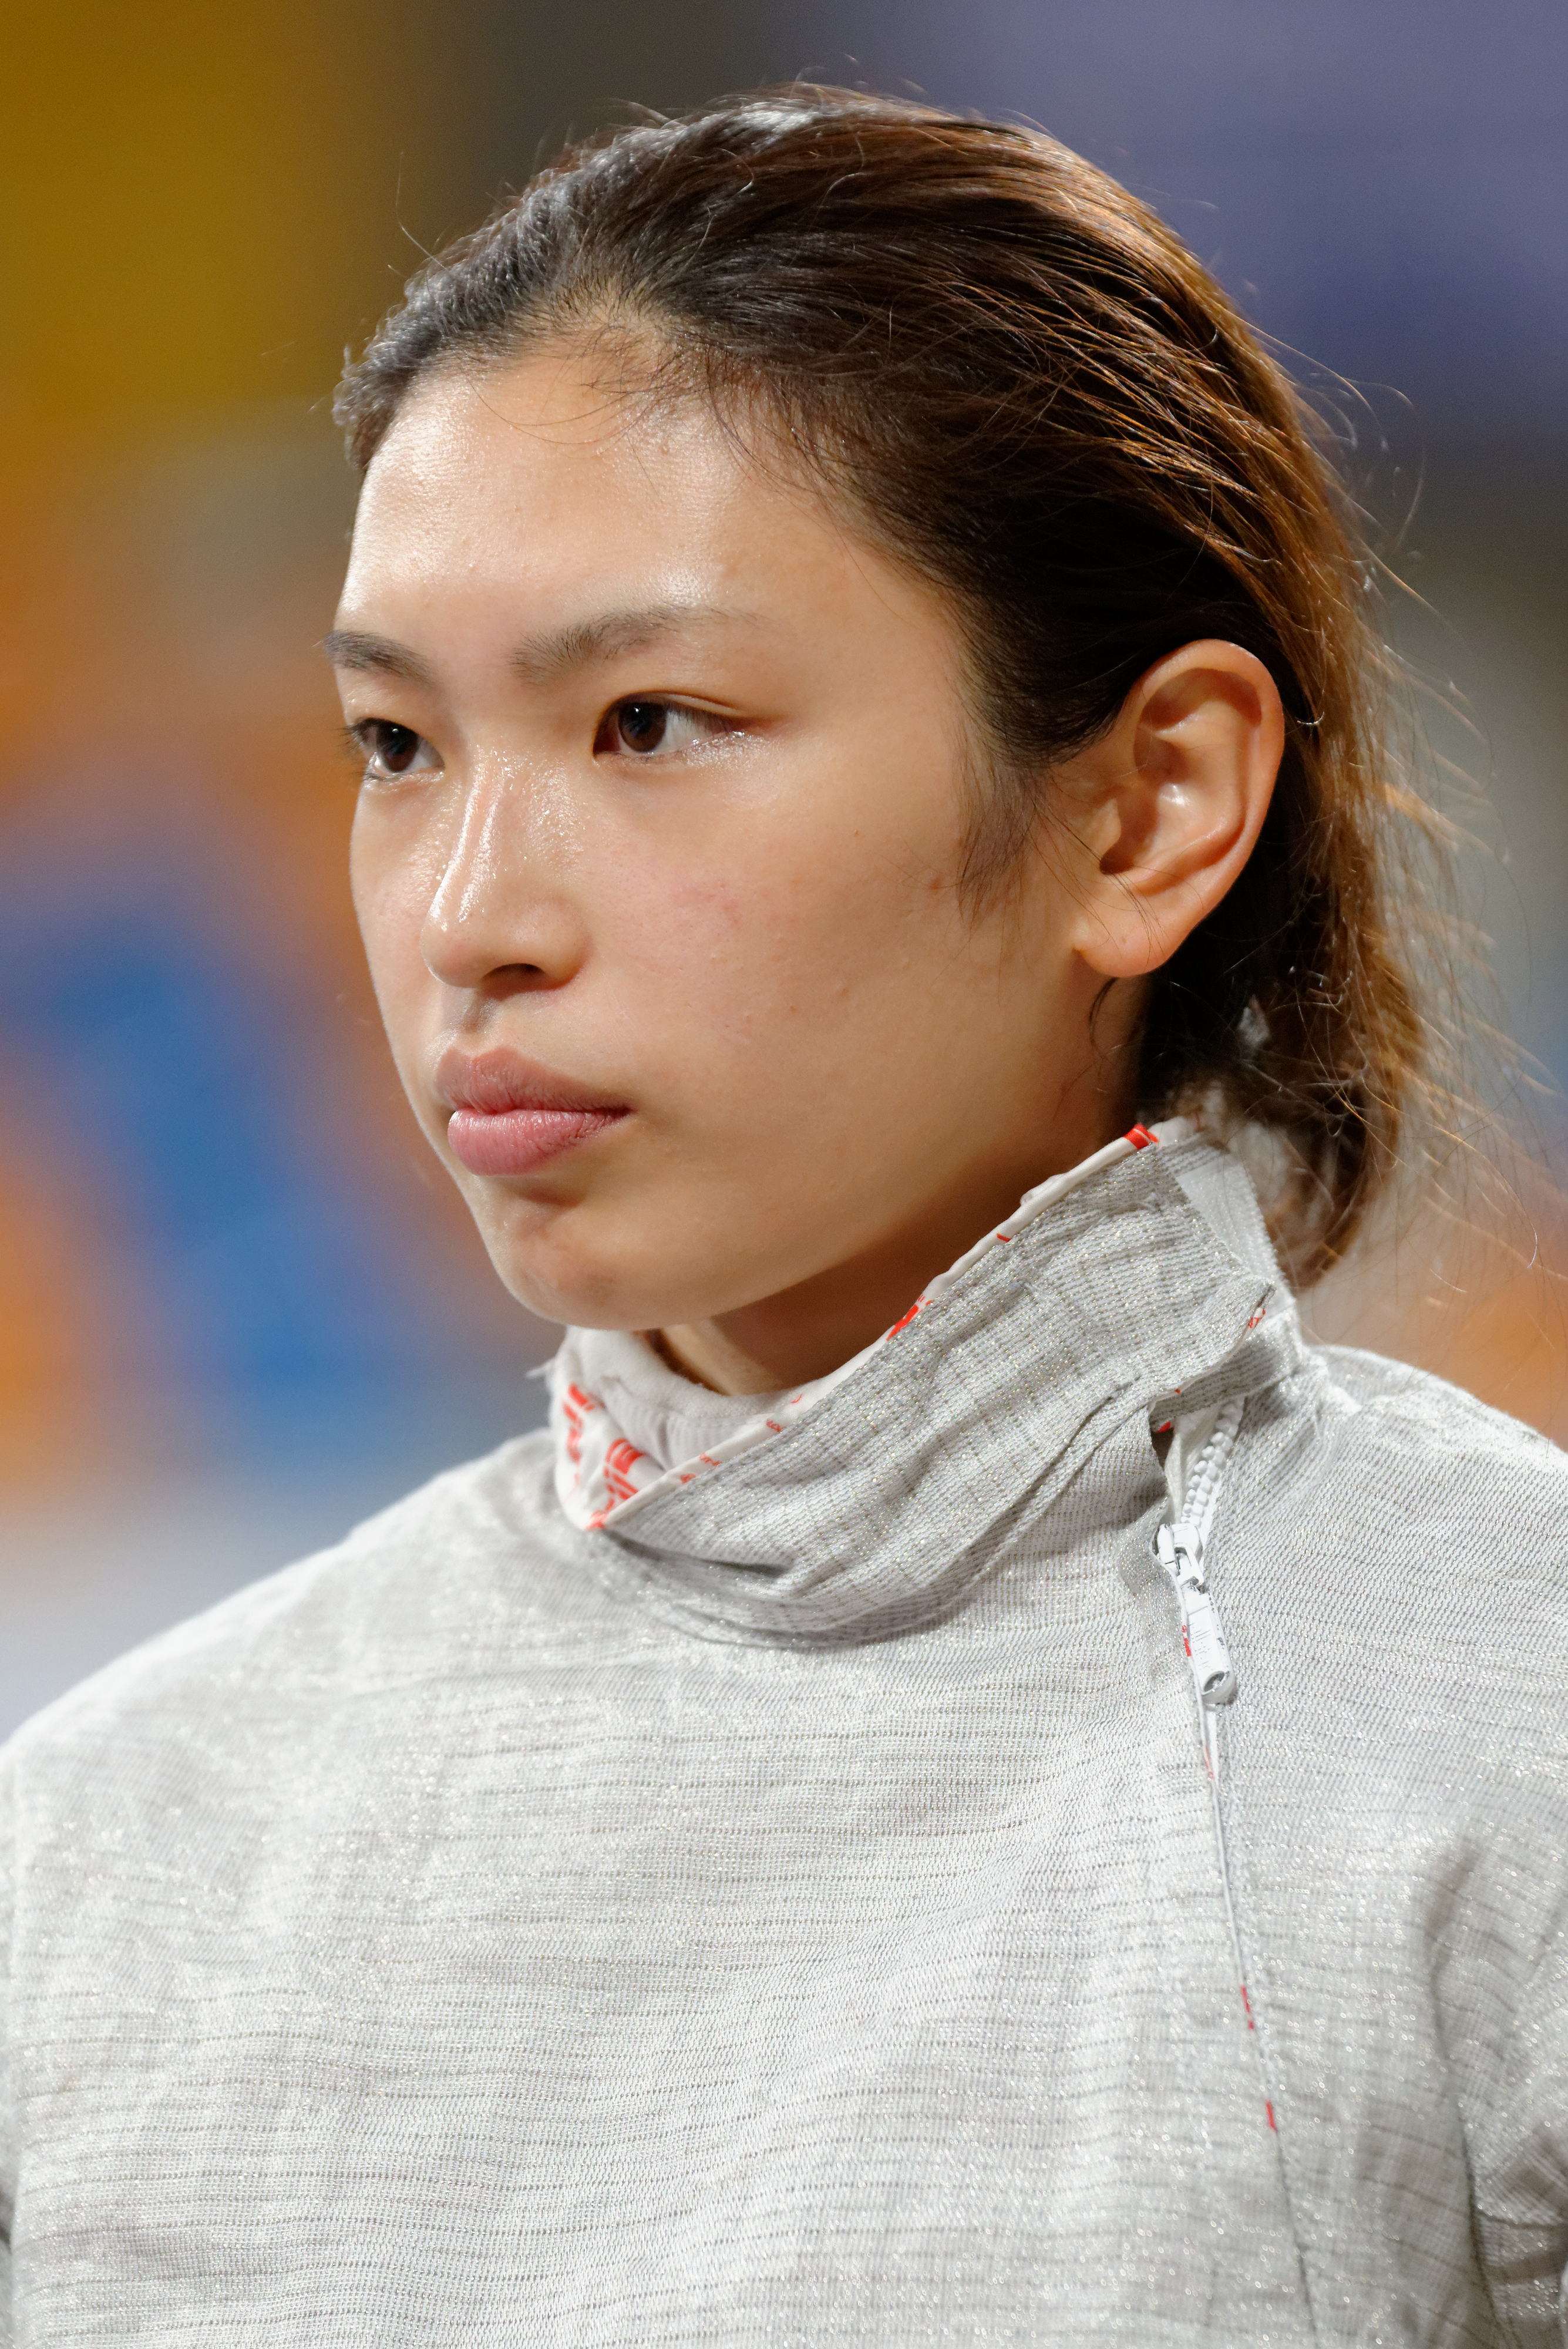 File:Chika Aoki 2014-15 Orleans WC teams t123424.jpg - Wikimedia ...